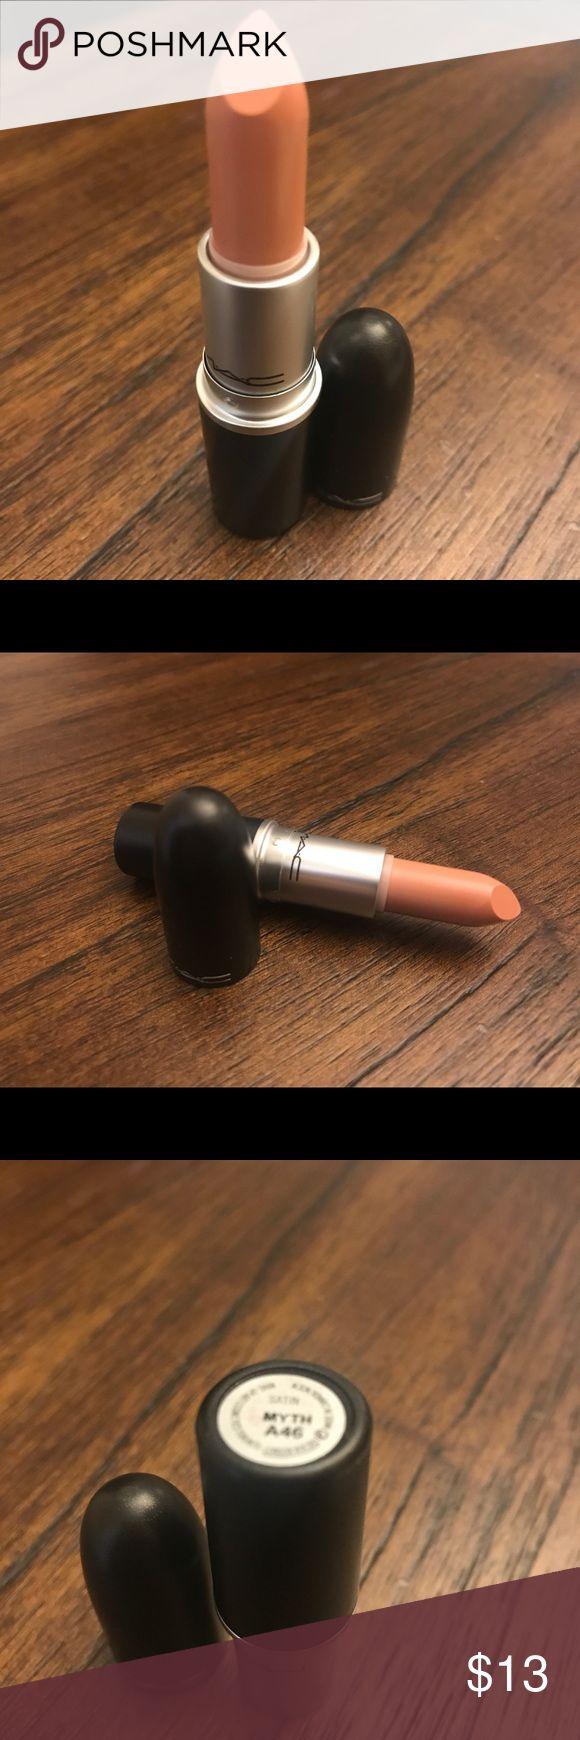 MAC Myth ✨💄 100% authentic MAC lipstick in Myth ! Gorgeous ♥️✨ MAC Cosmetics Makeup Lipstick